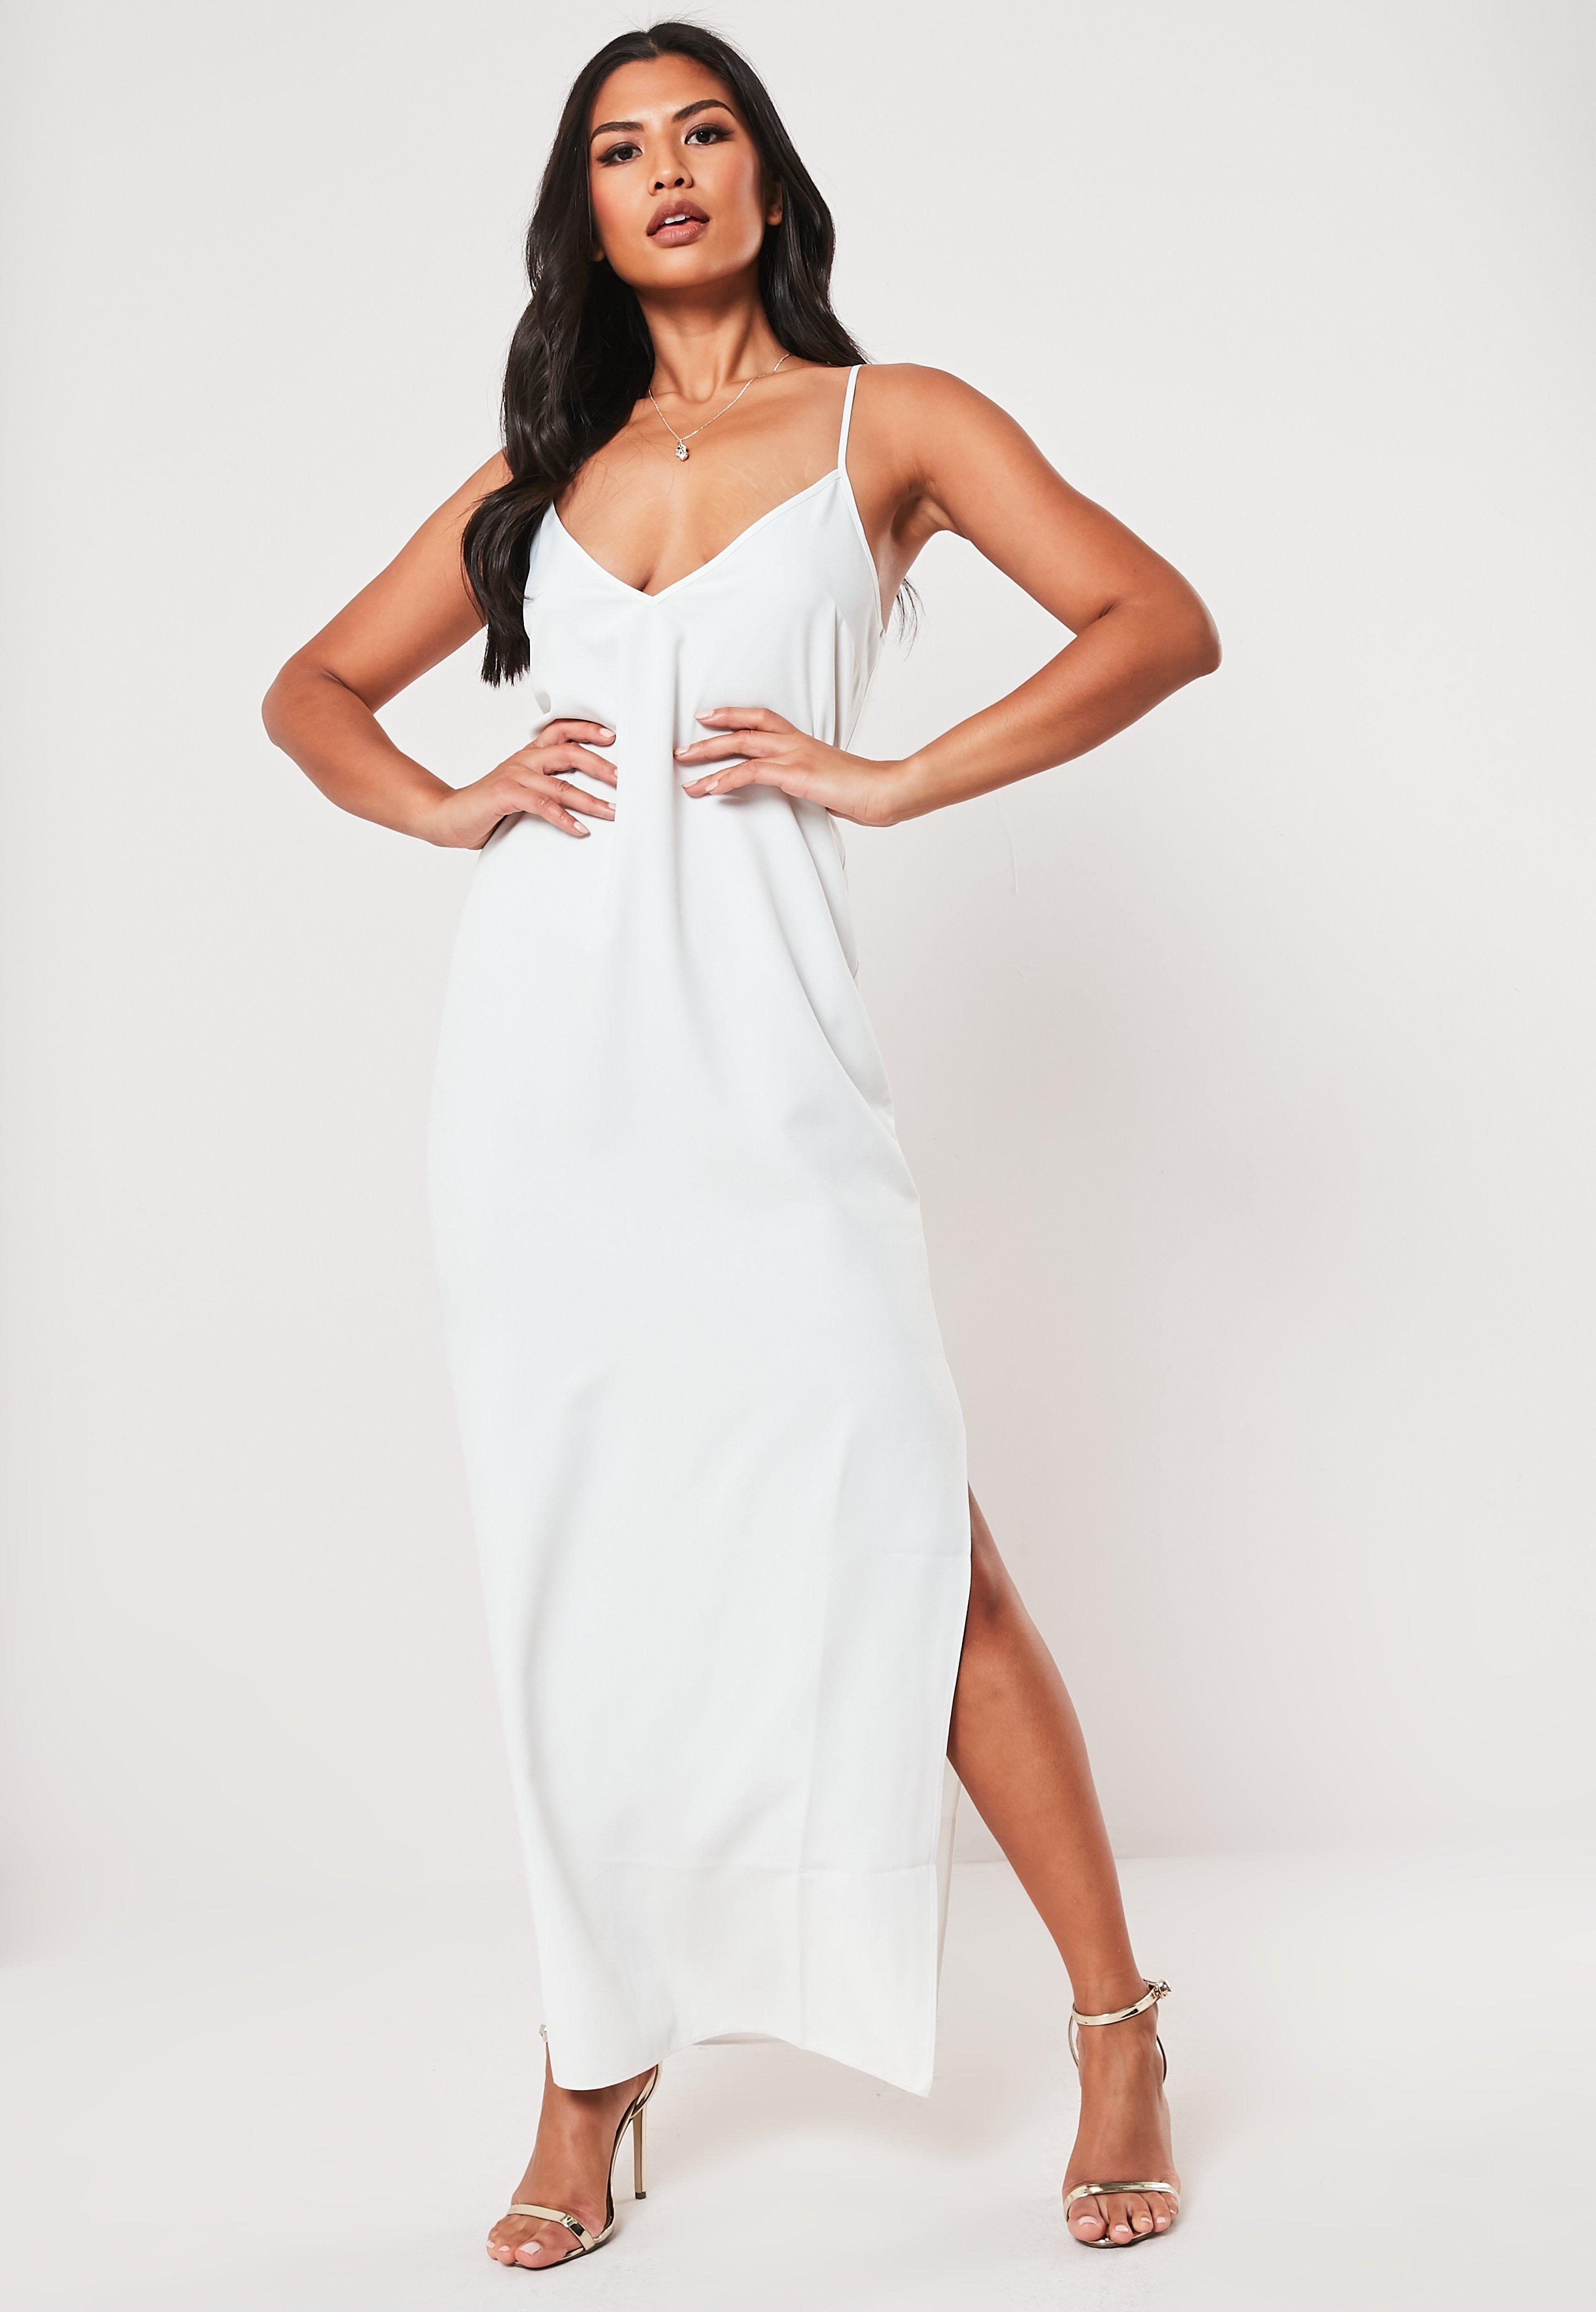 d639b8c4a769b White Dresses | Women's White Dresses Online - Missguided